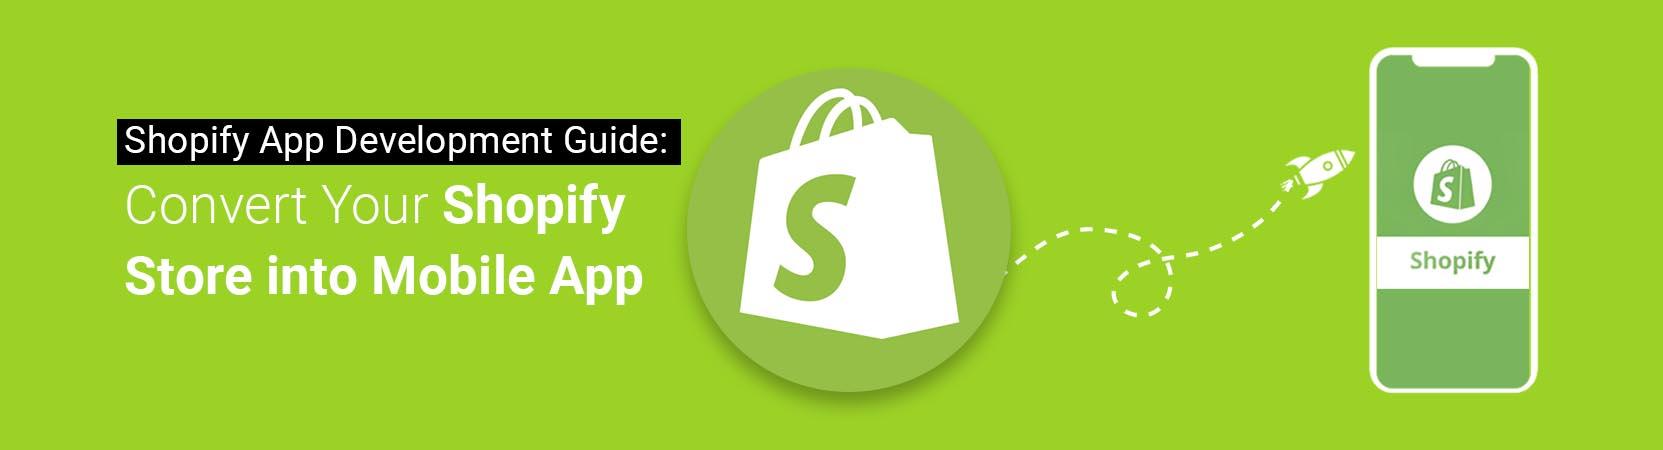 shopify app development guide